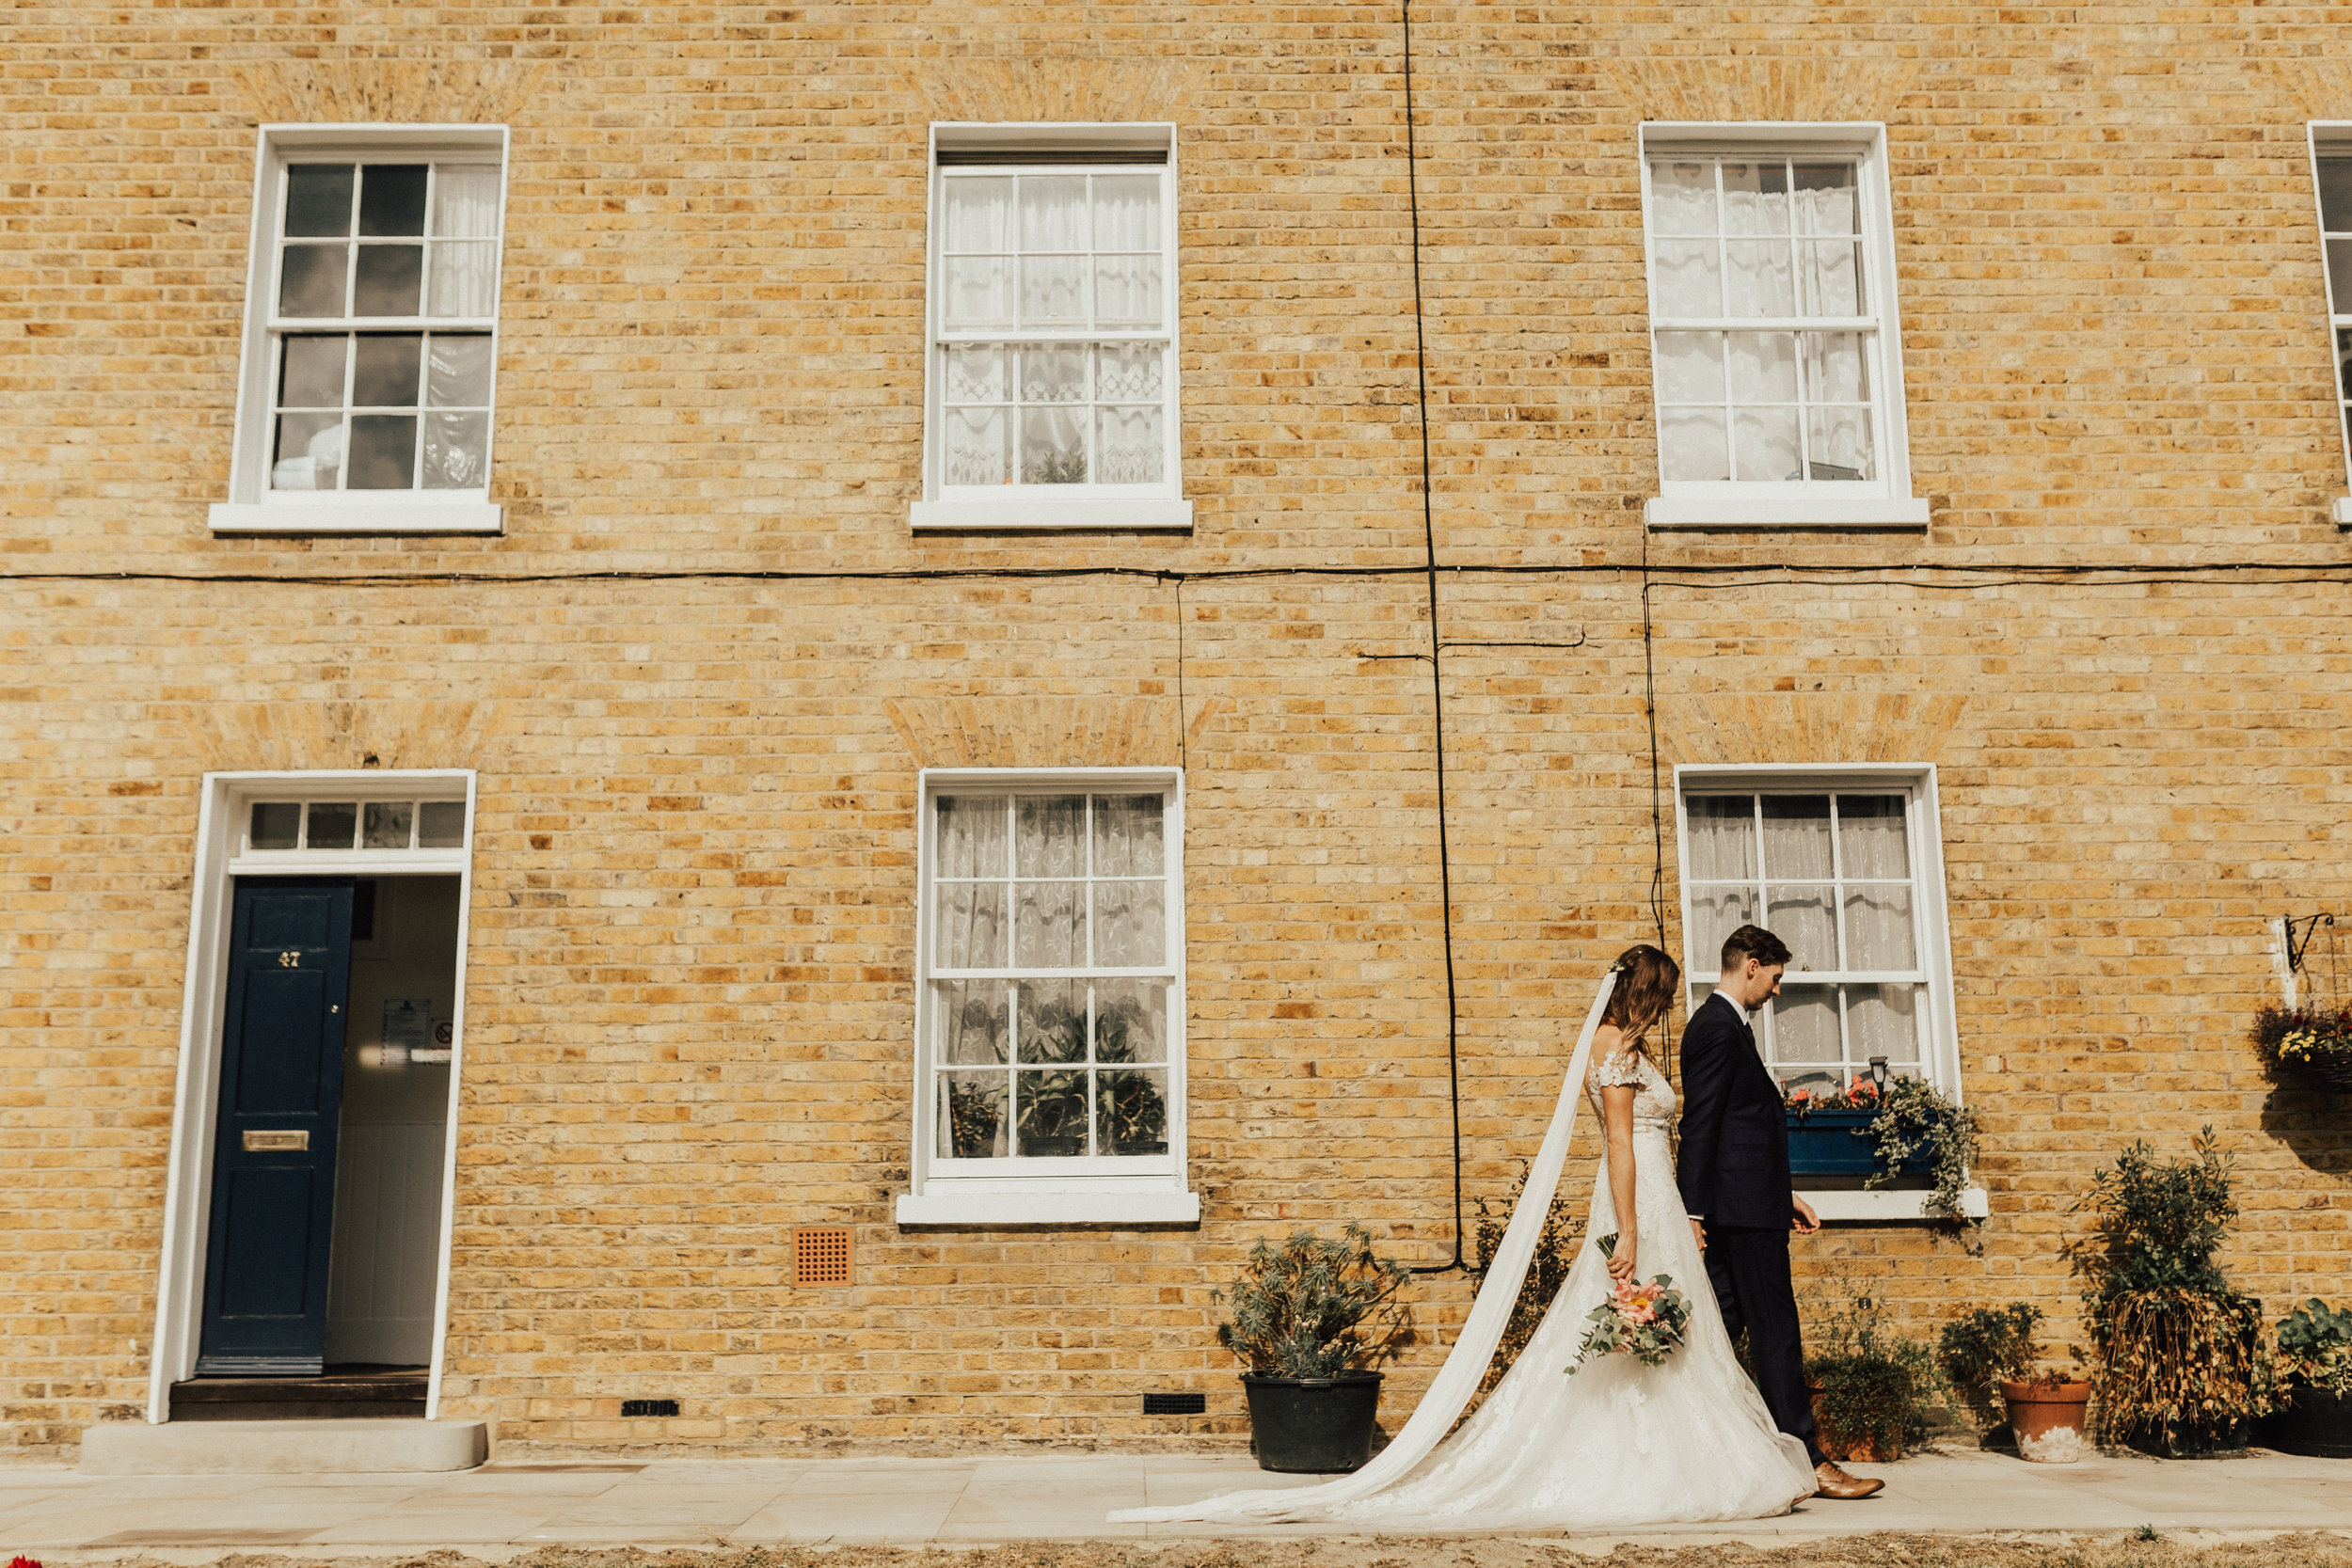 Laura-Benn-The-Asylum-London-The-Ace-Hotel-Wedding-Alternative-Darina-Stoda-Photography-392.jpg